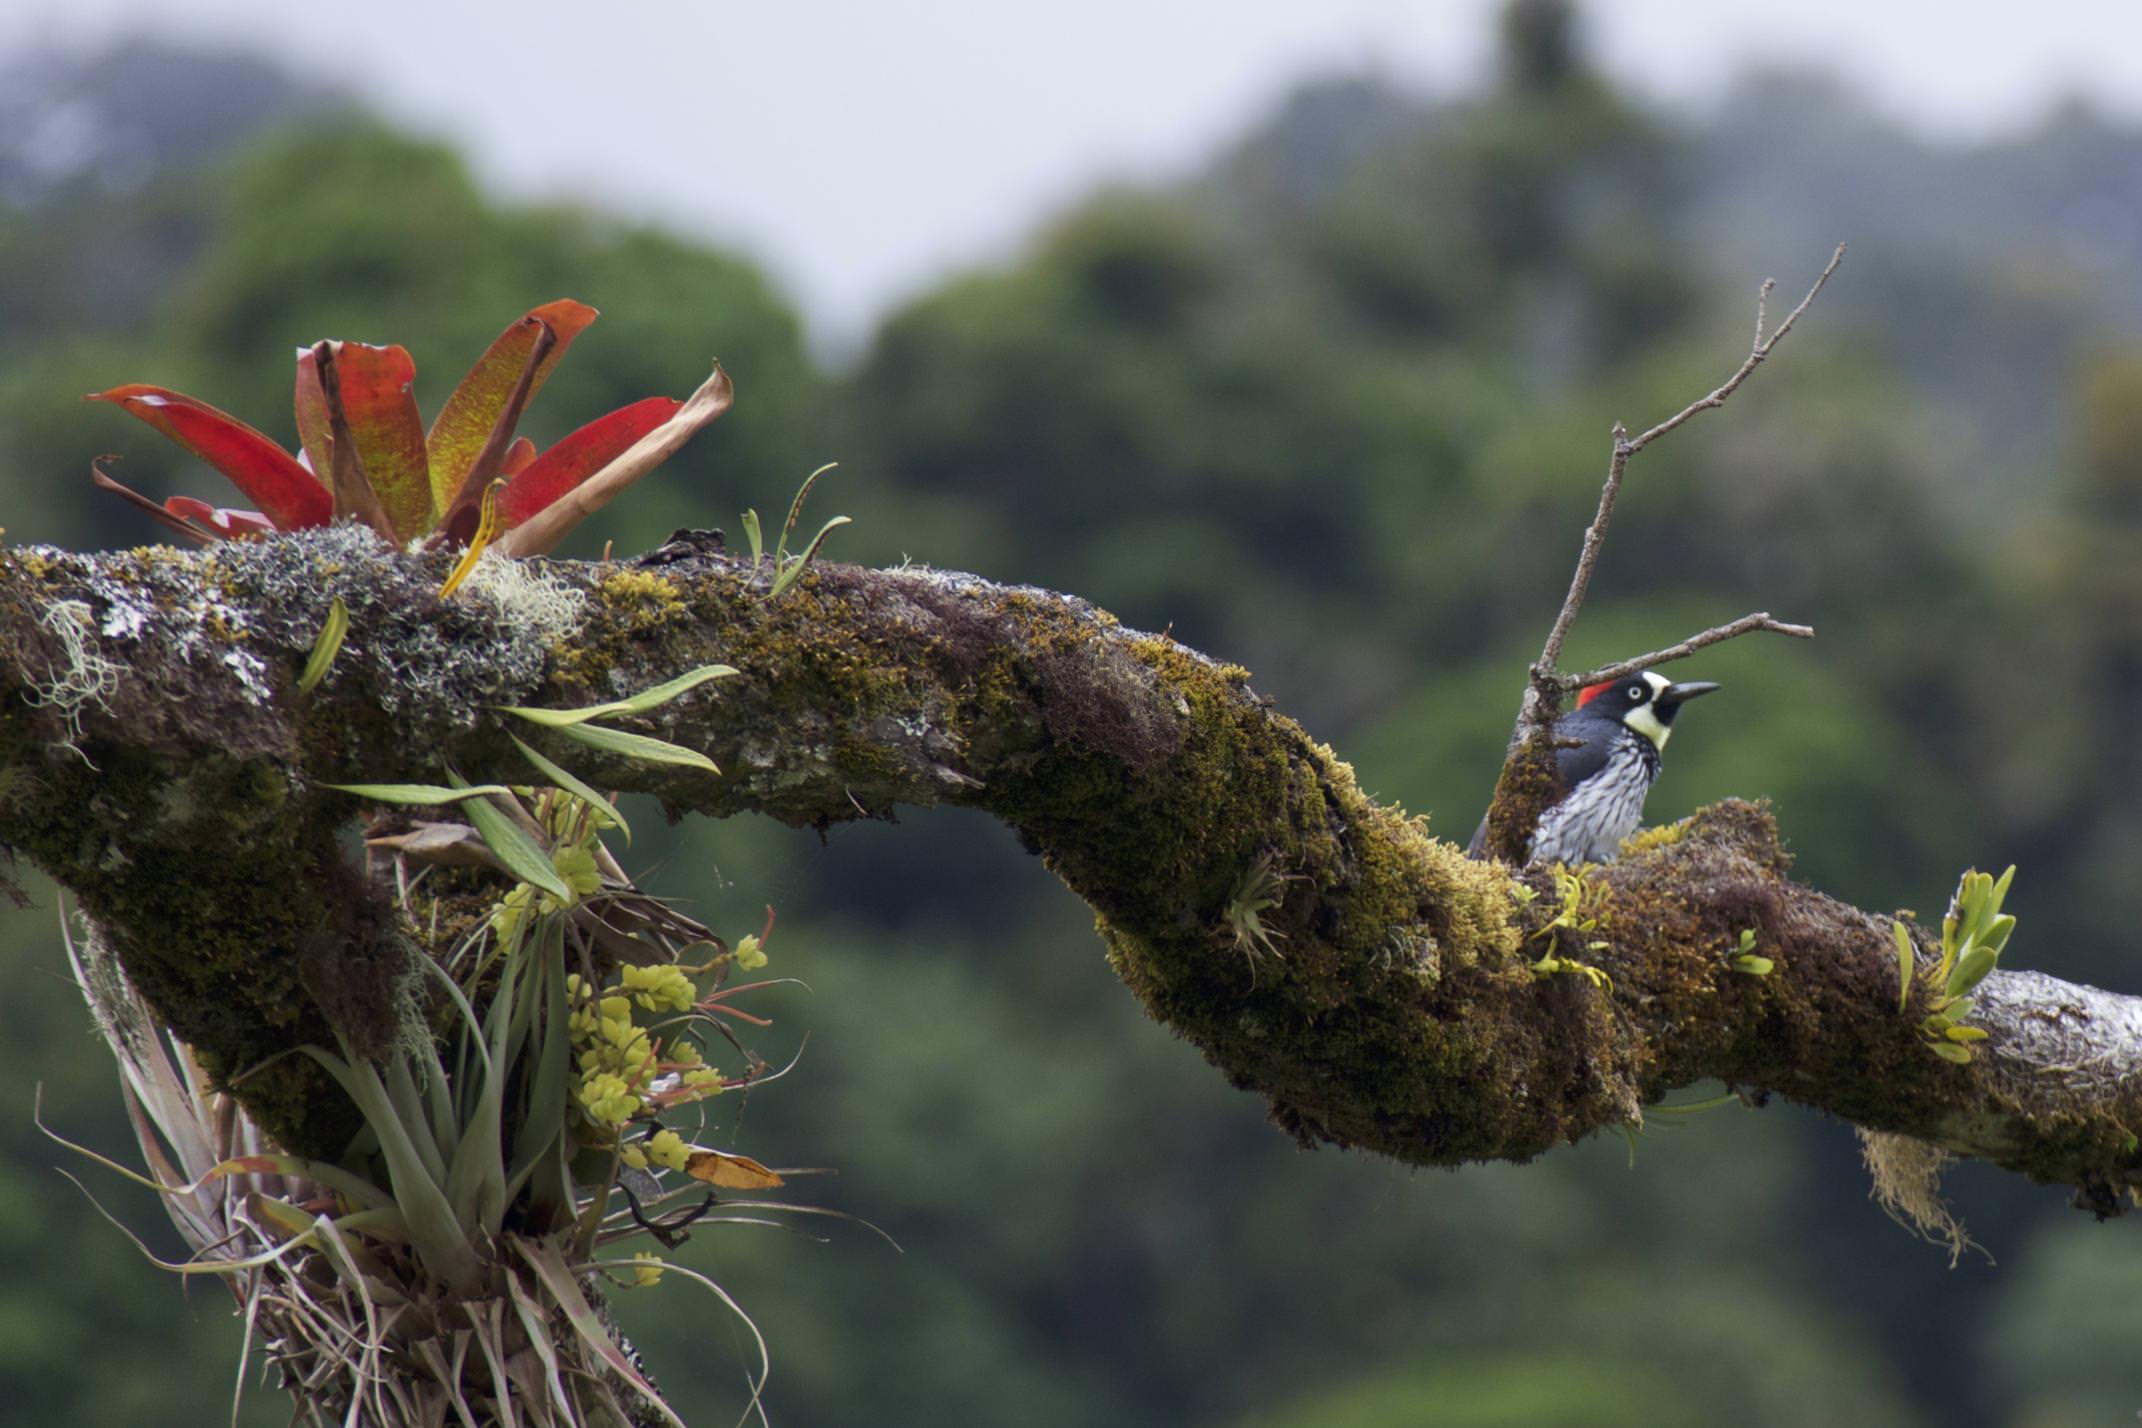 Costa rica san gerardo dota tree creeper bromeliad on branch talamanca hiking